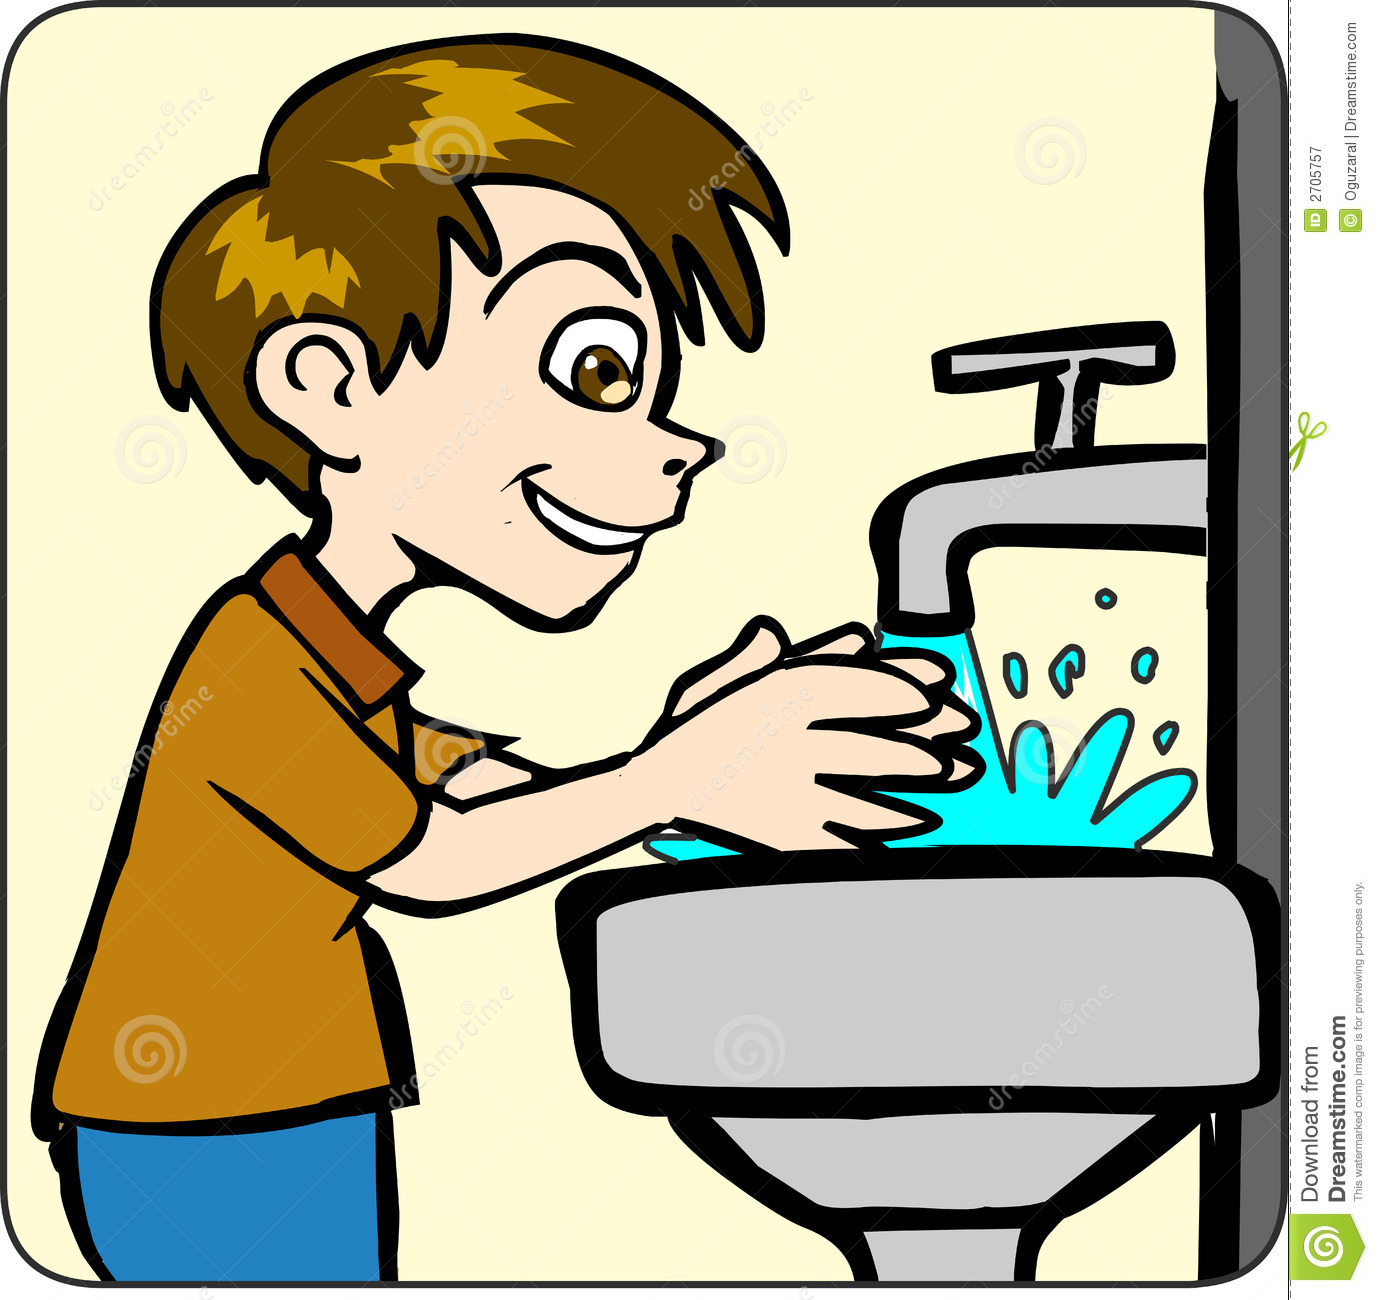 Kids washing hands clipart image transparent library Clipart Kids Washing Hands Collection #20184 - Clipartimage.com image transparent library